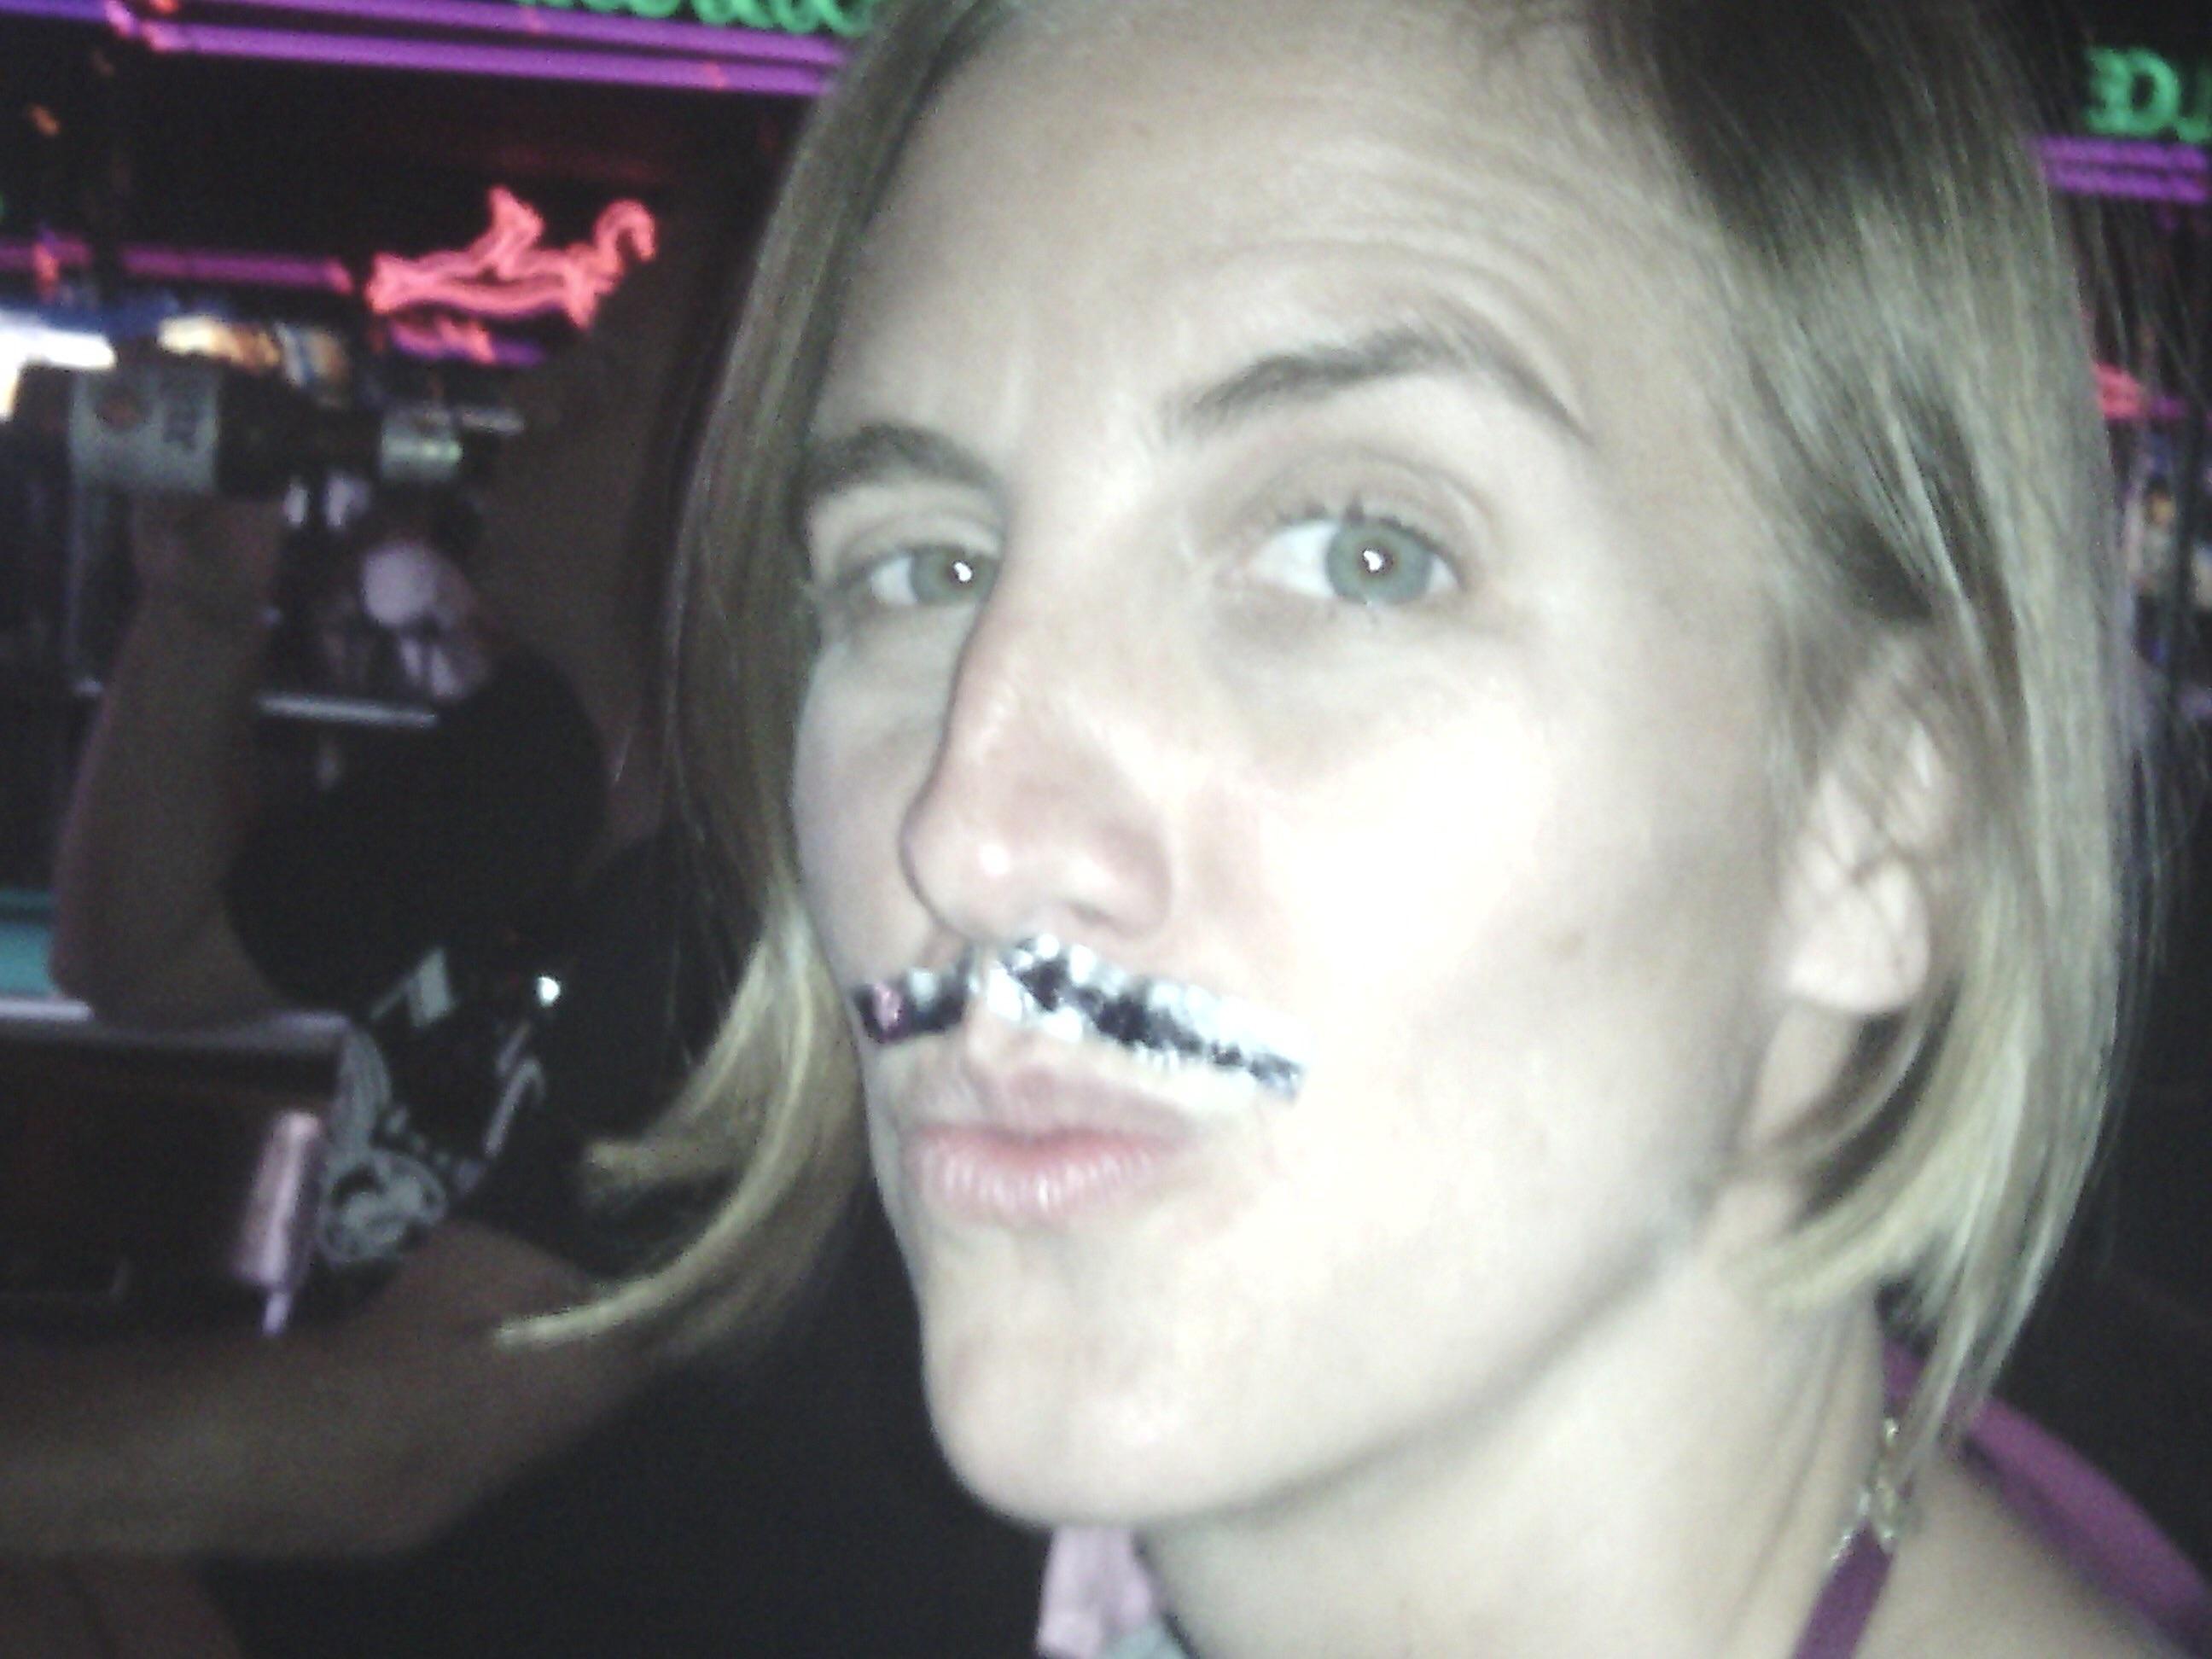 Undercover Emily ... shhh.